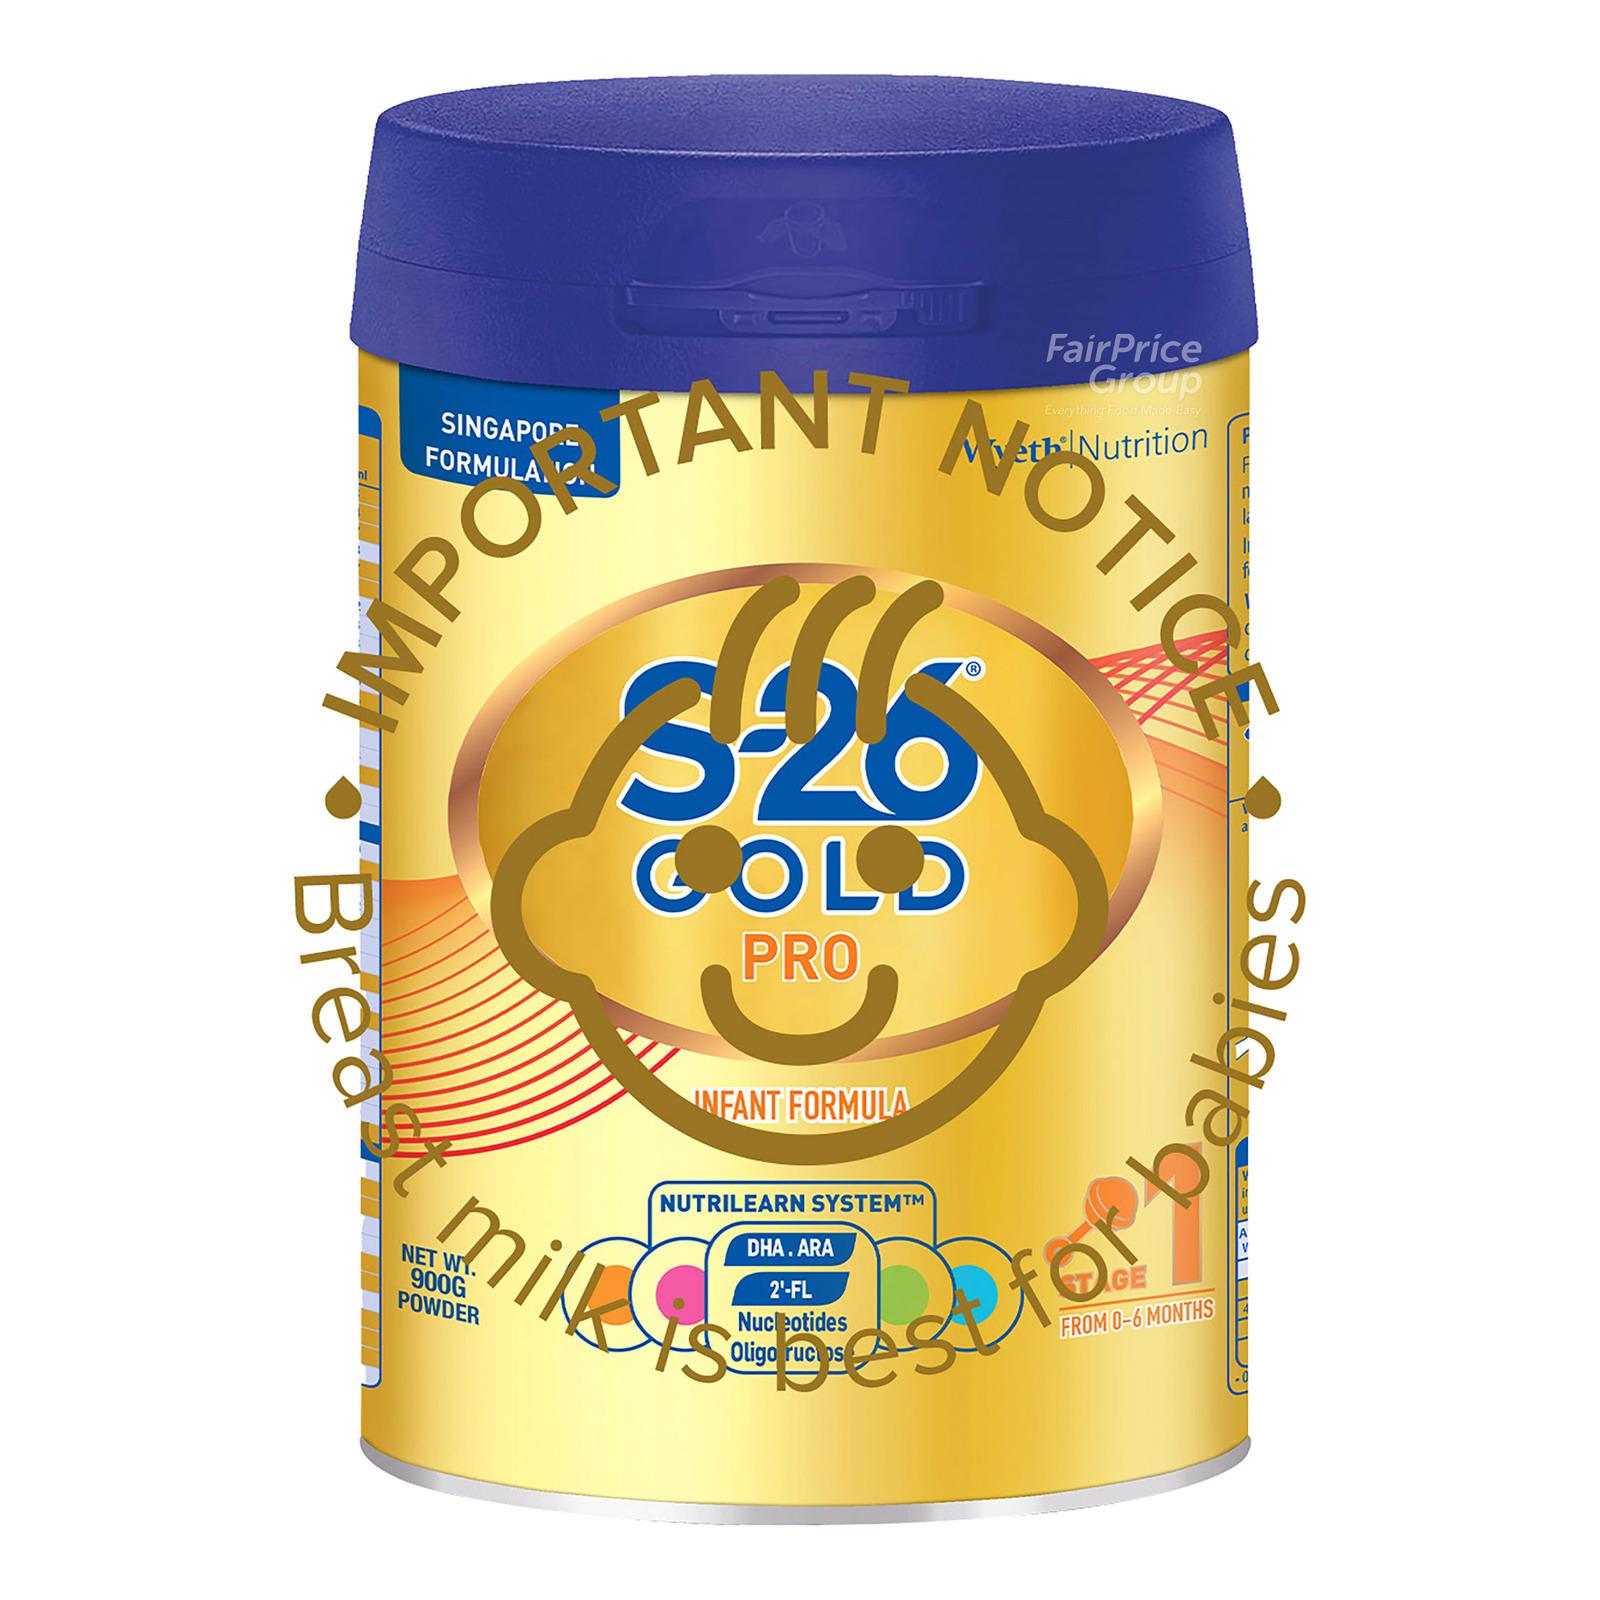 Wyeth S26 Gold Pro Infant Milk Formula - Step 1